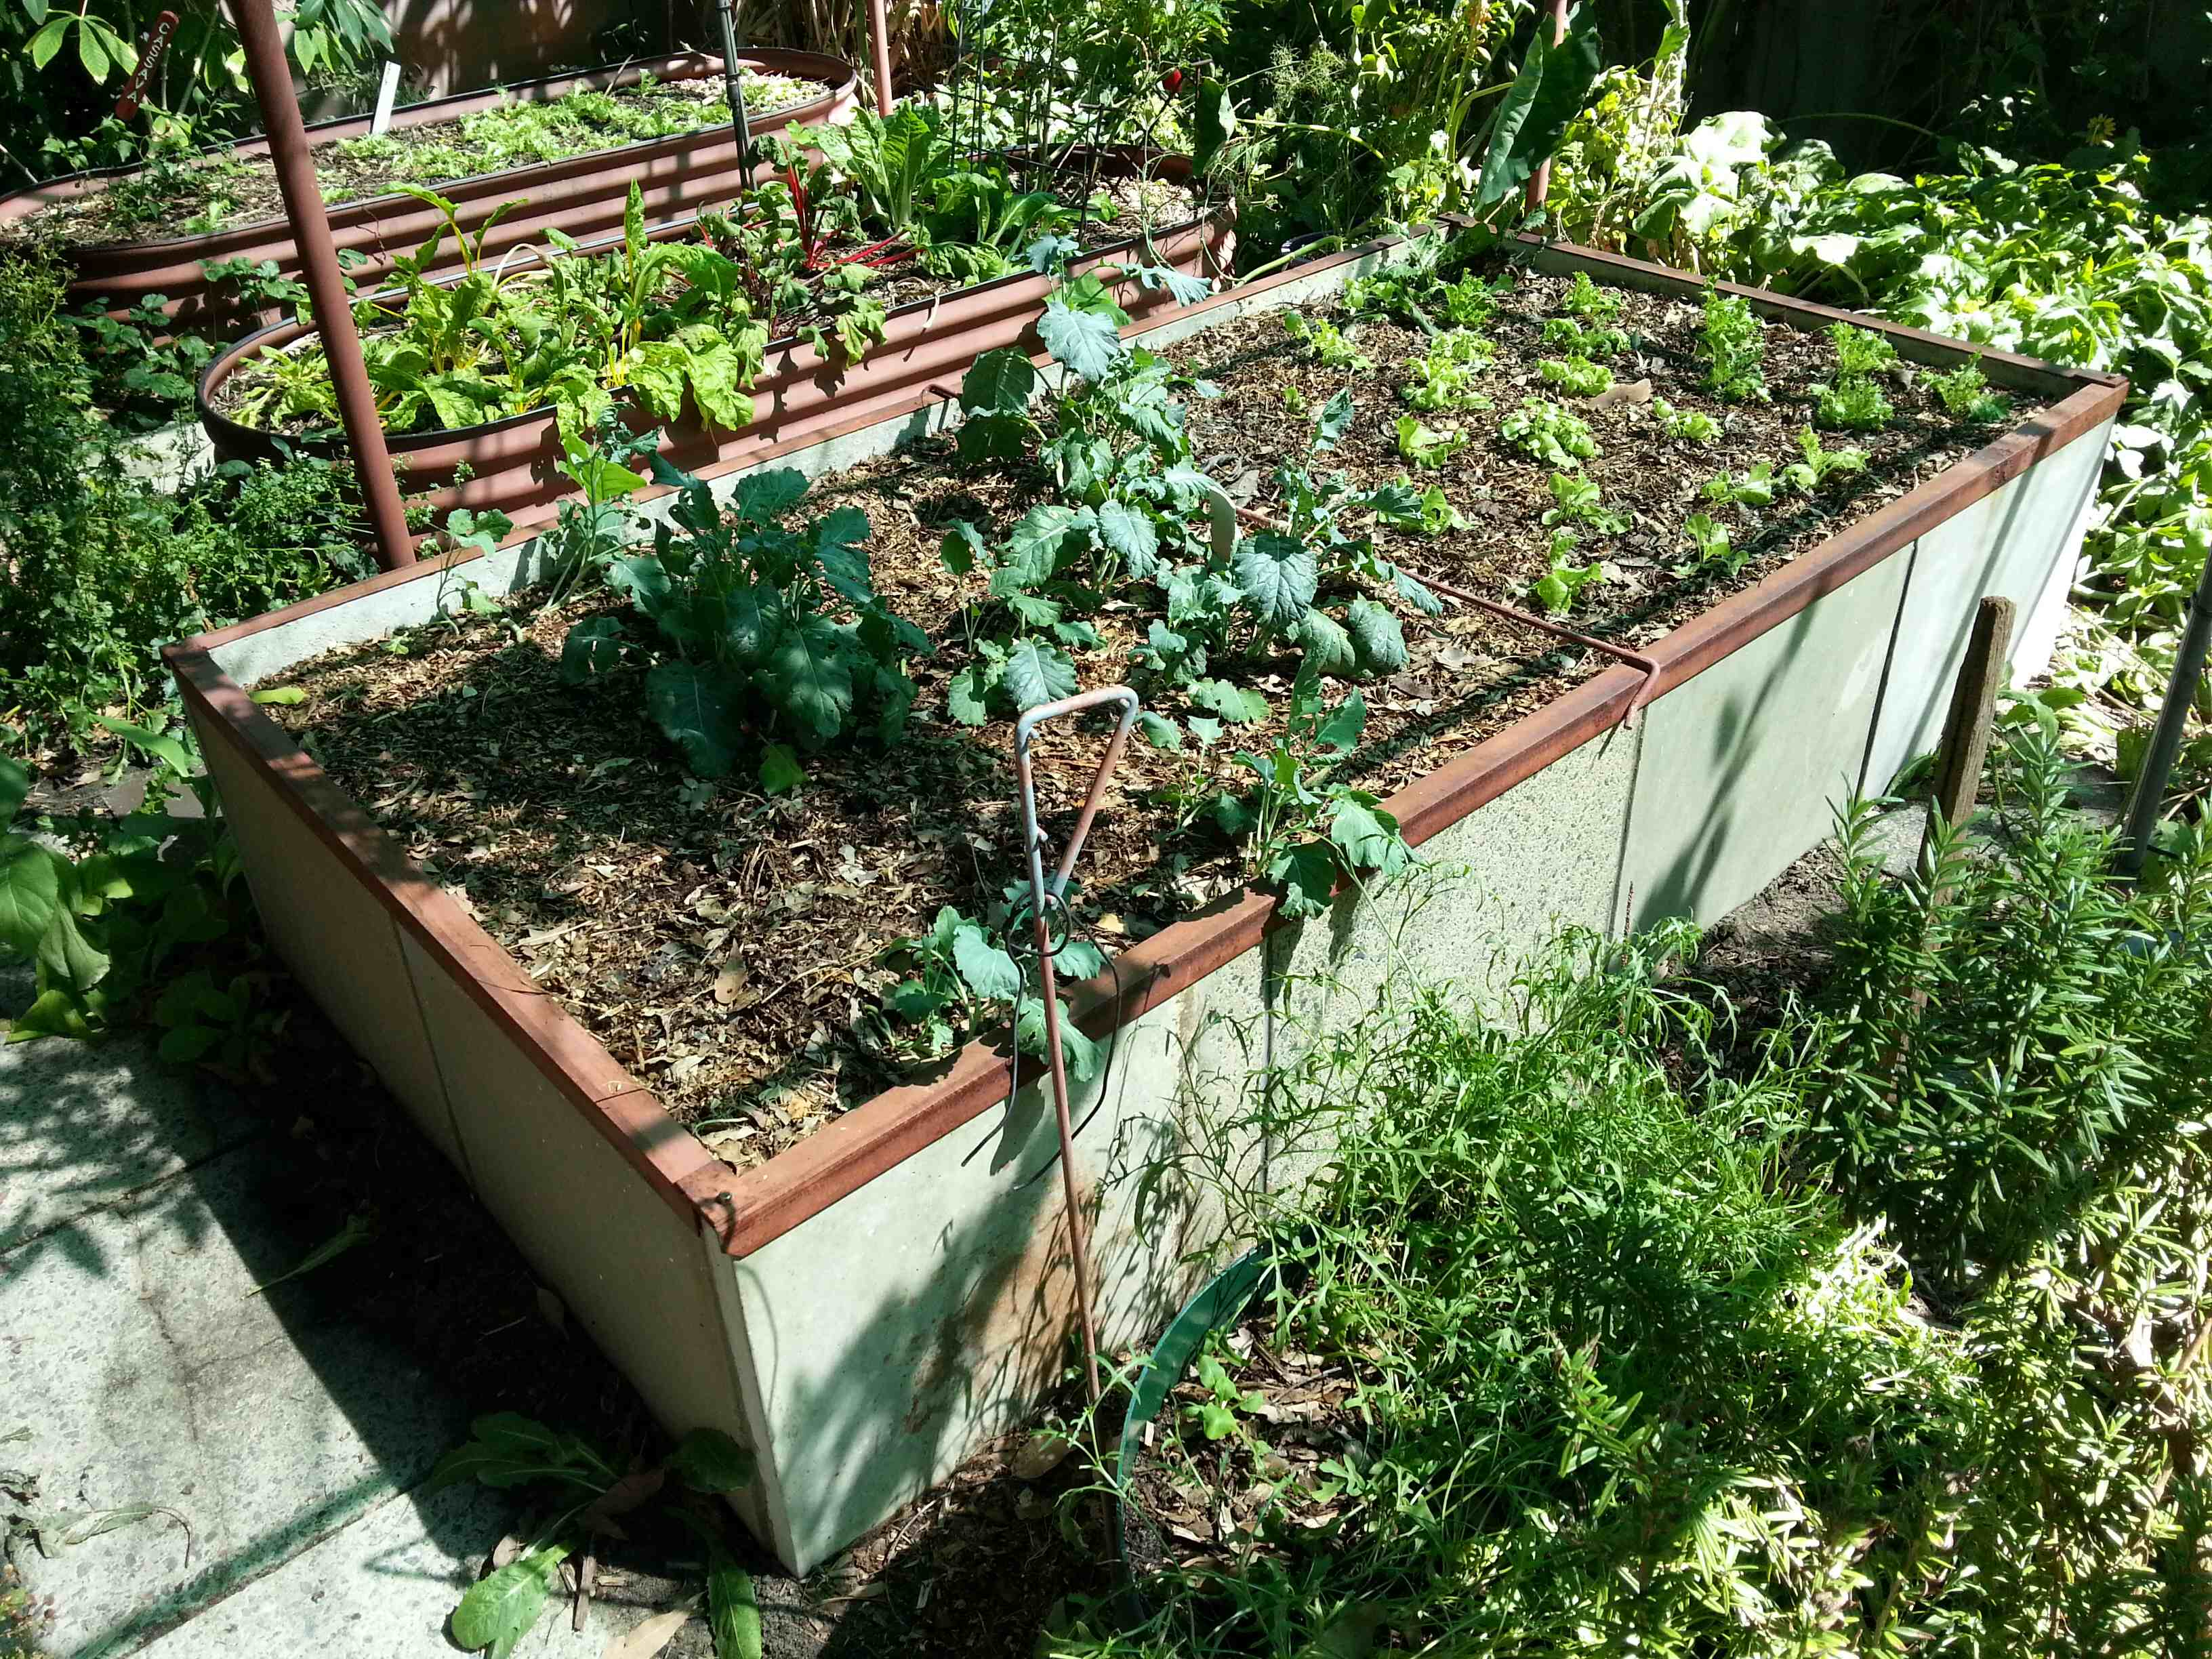 Cement Raised Flower Beds : Raised vegetable garden beds on concrete wood vs